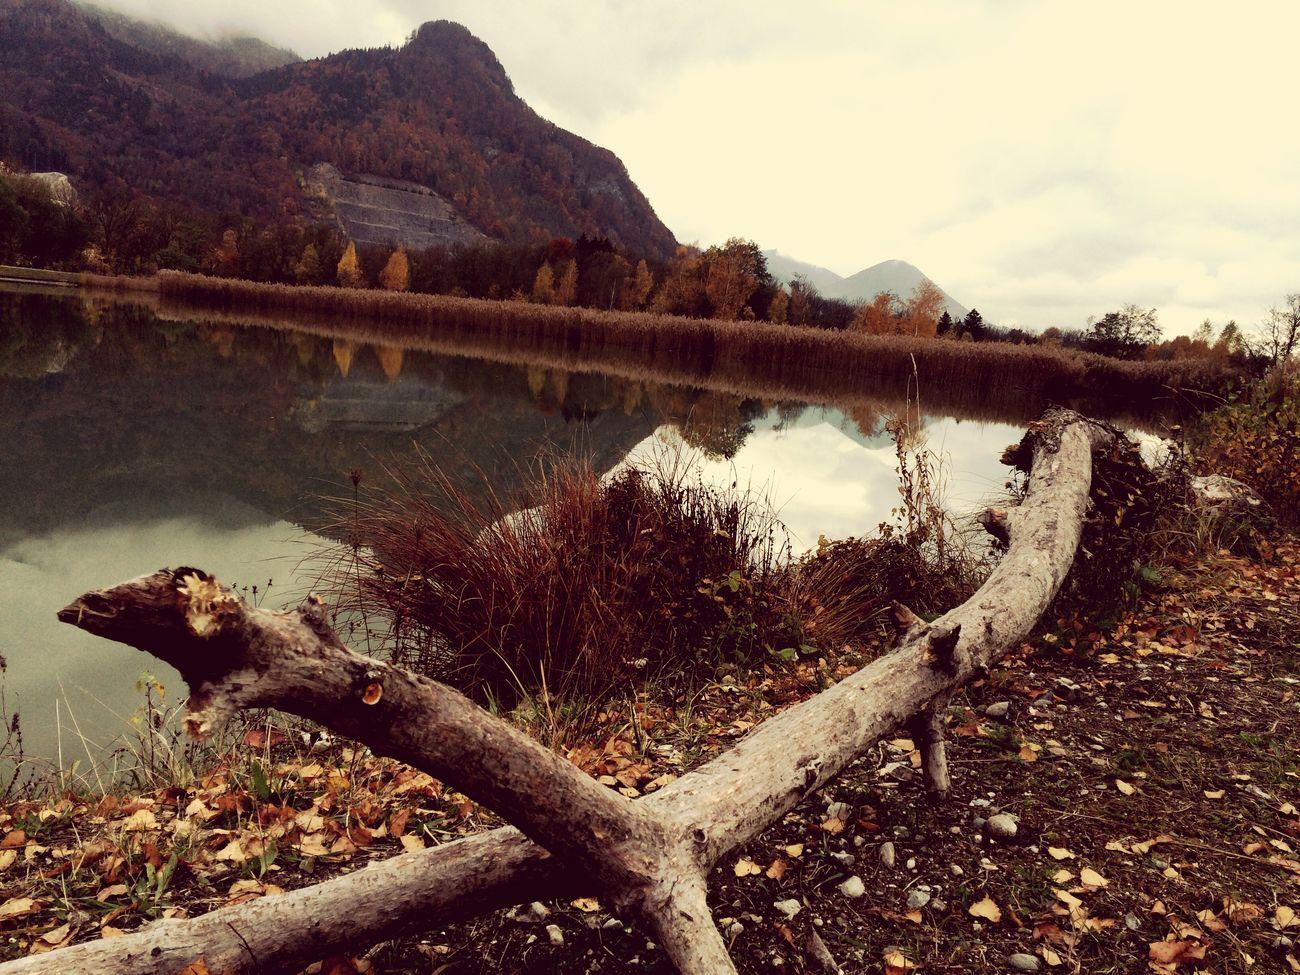 Herbst Holz Inn